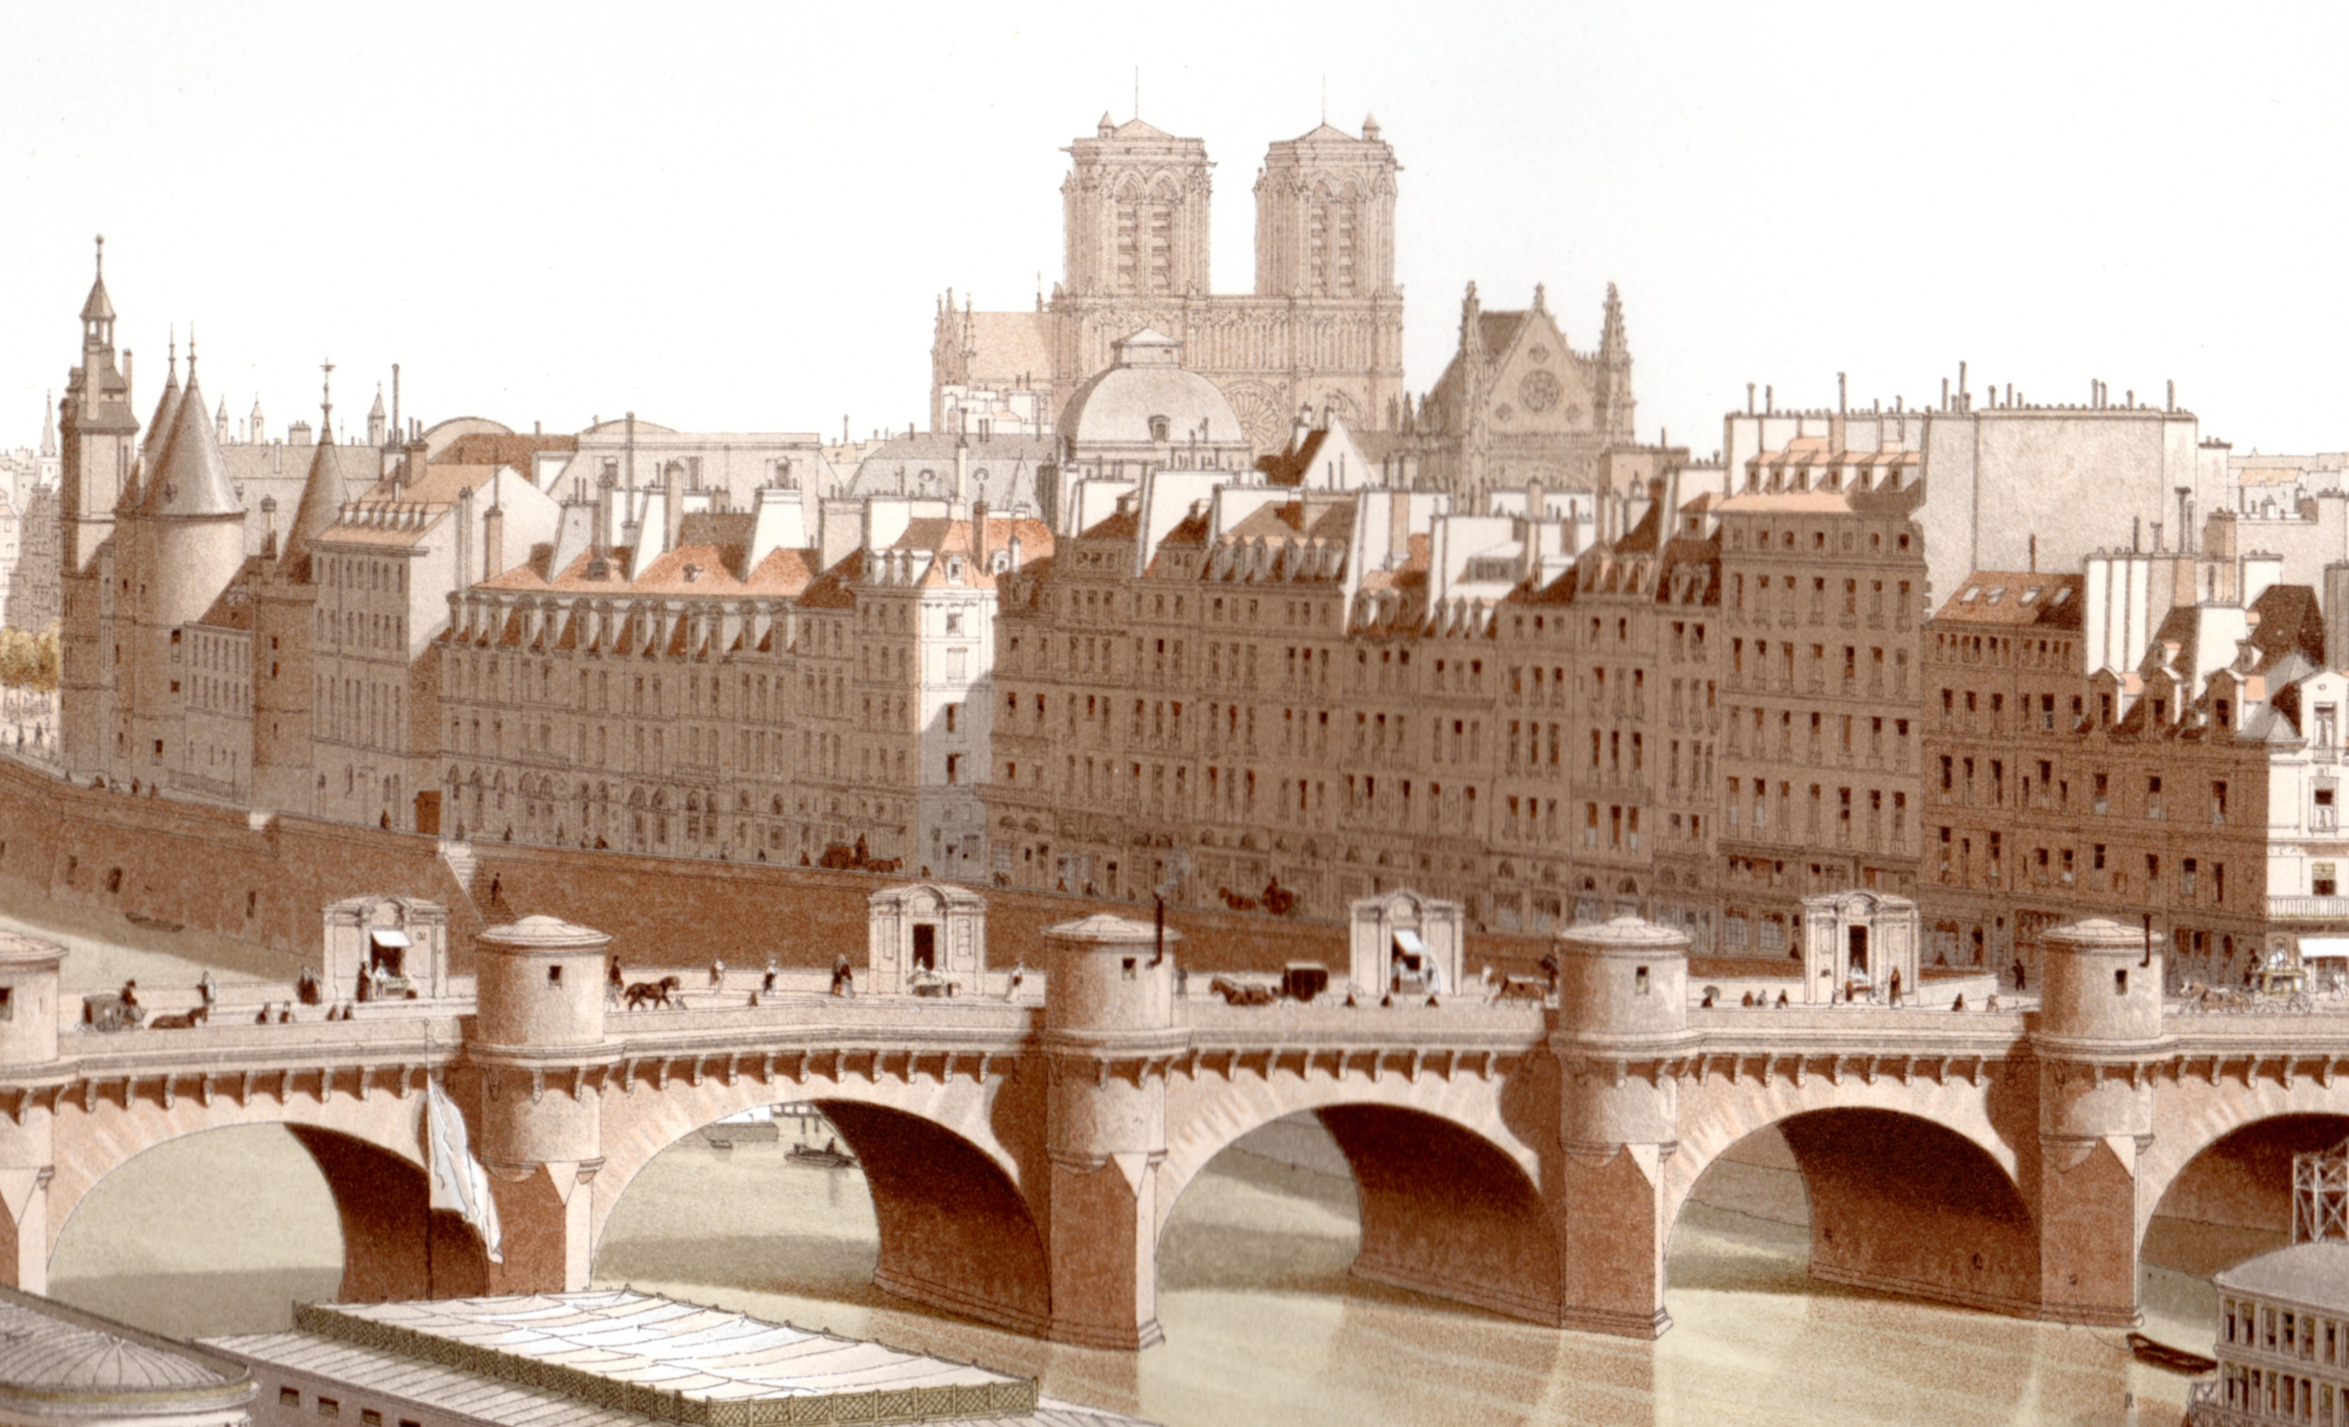 Hoffbauer, H.F. –Paris through the ages